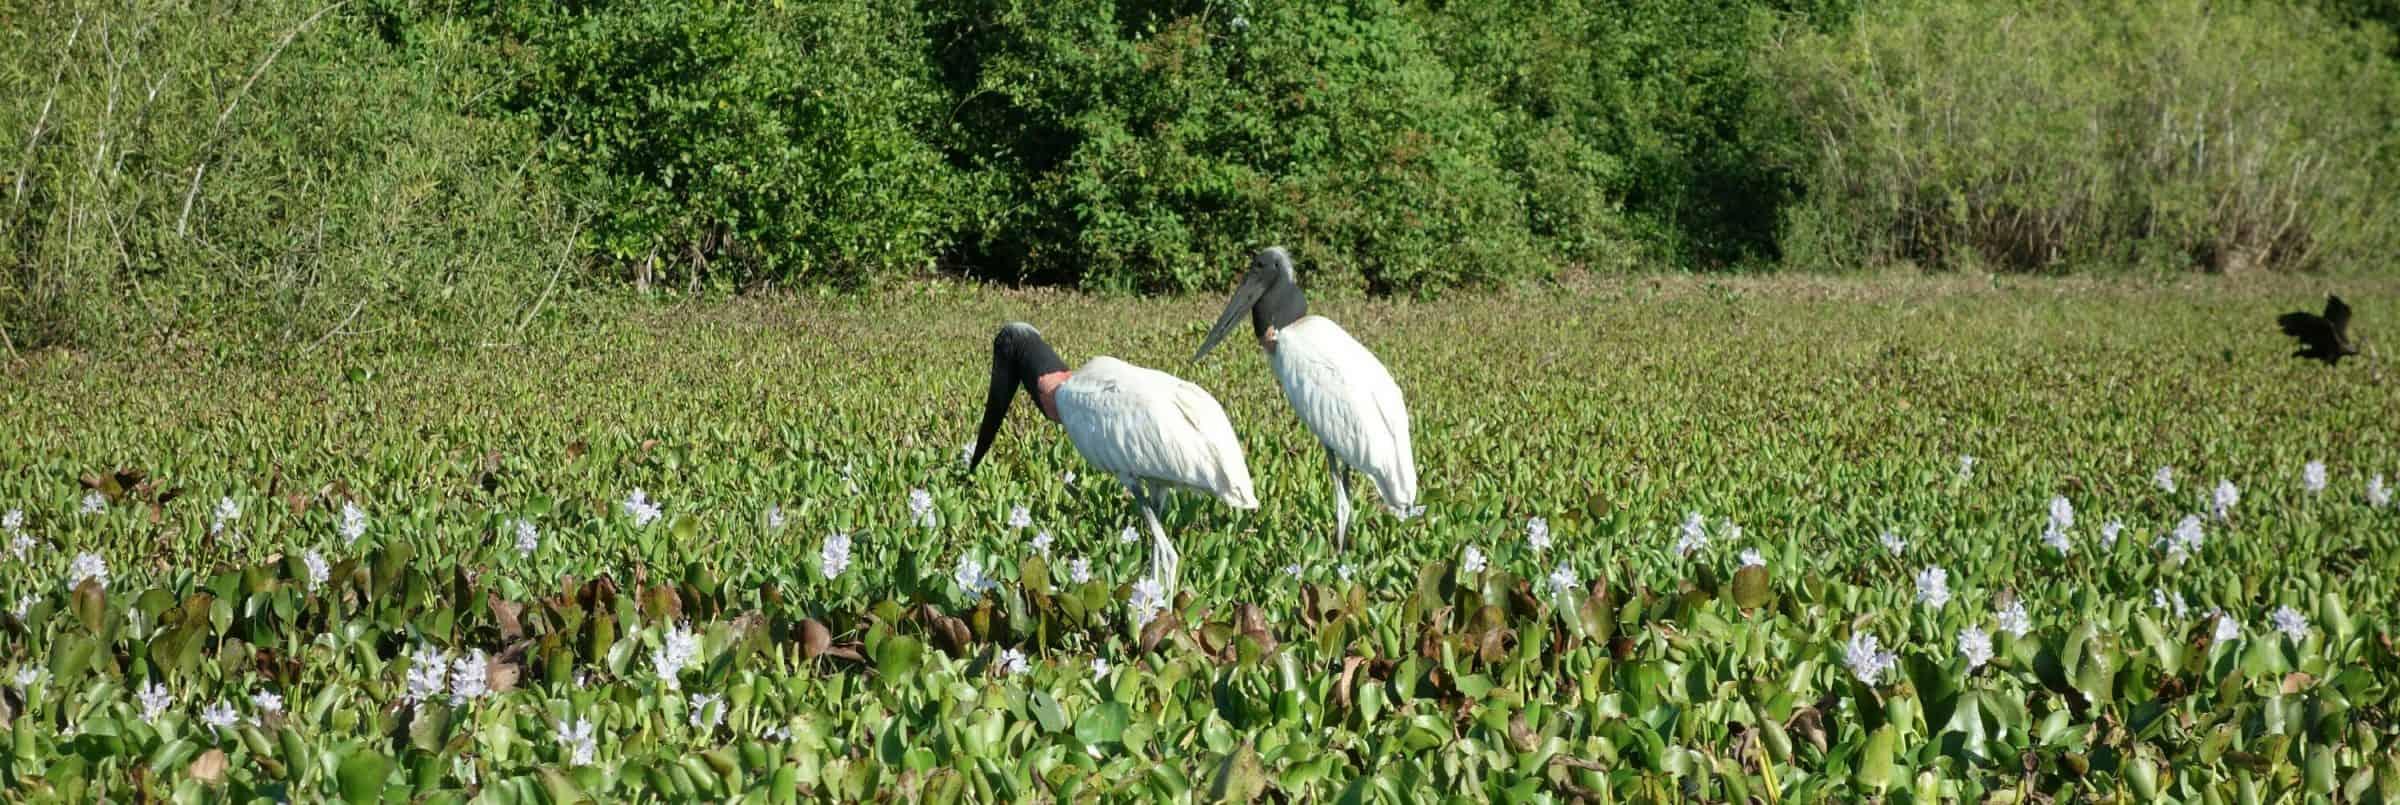 Storks, Pantanal, Brazil